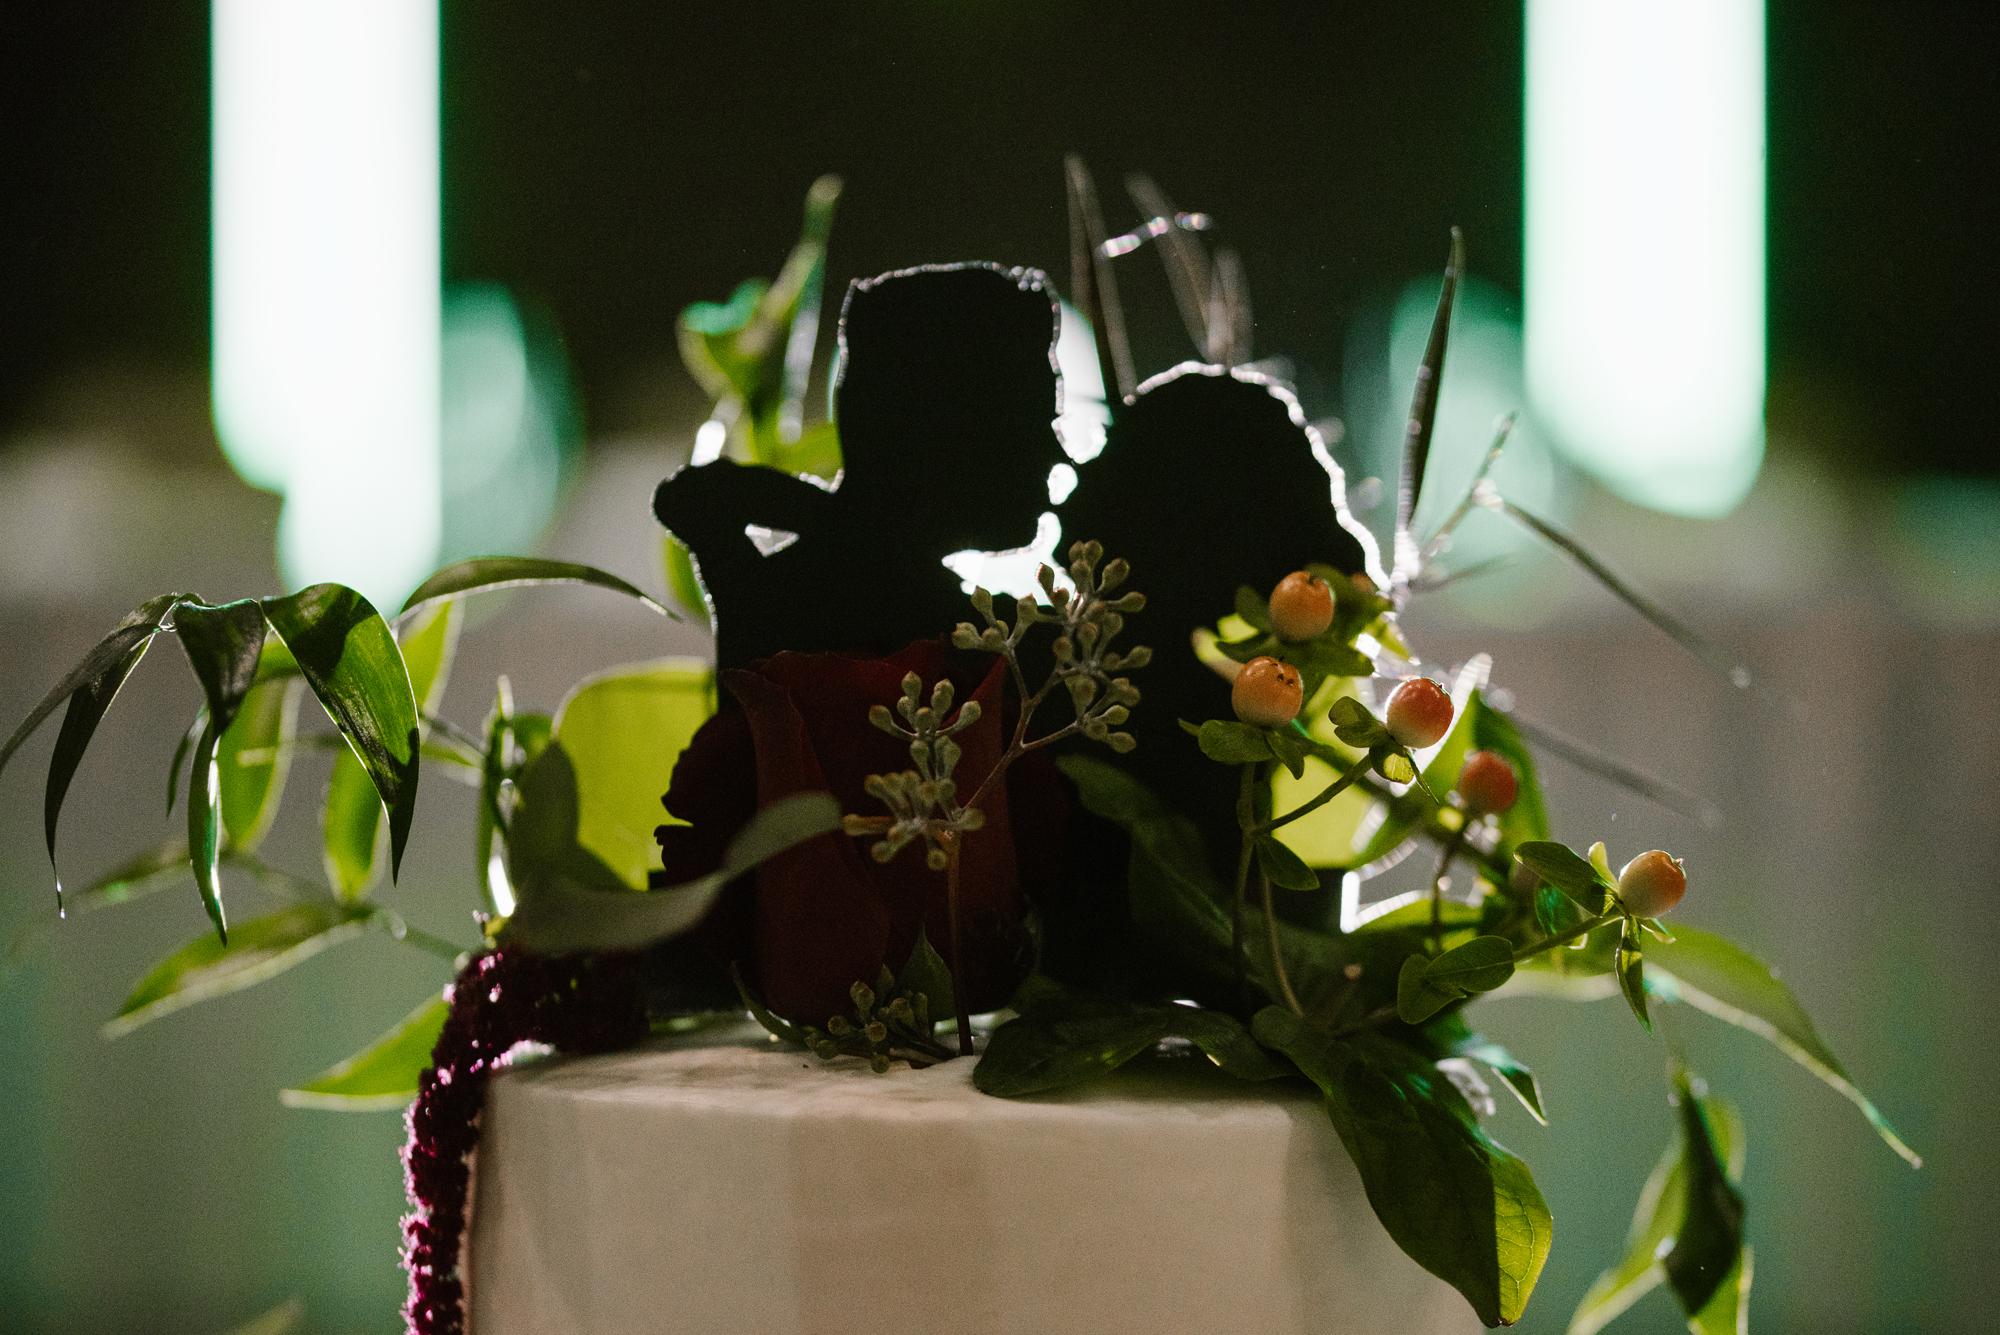 south-bend-indiana-wedding-photographer (2).jpg